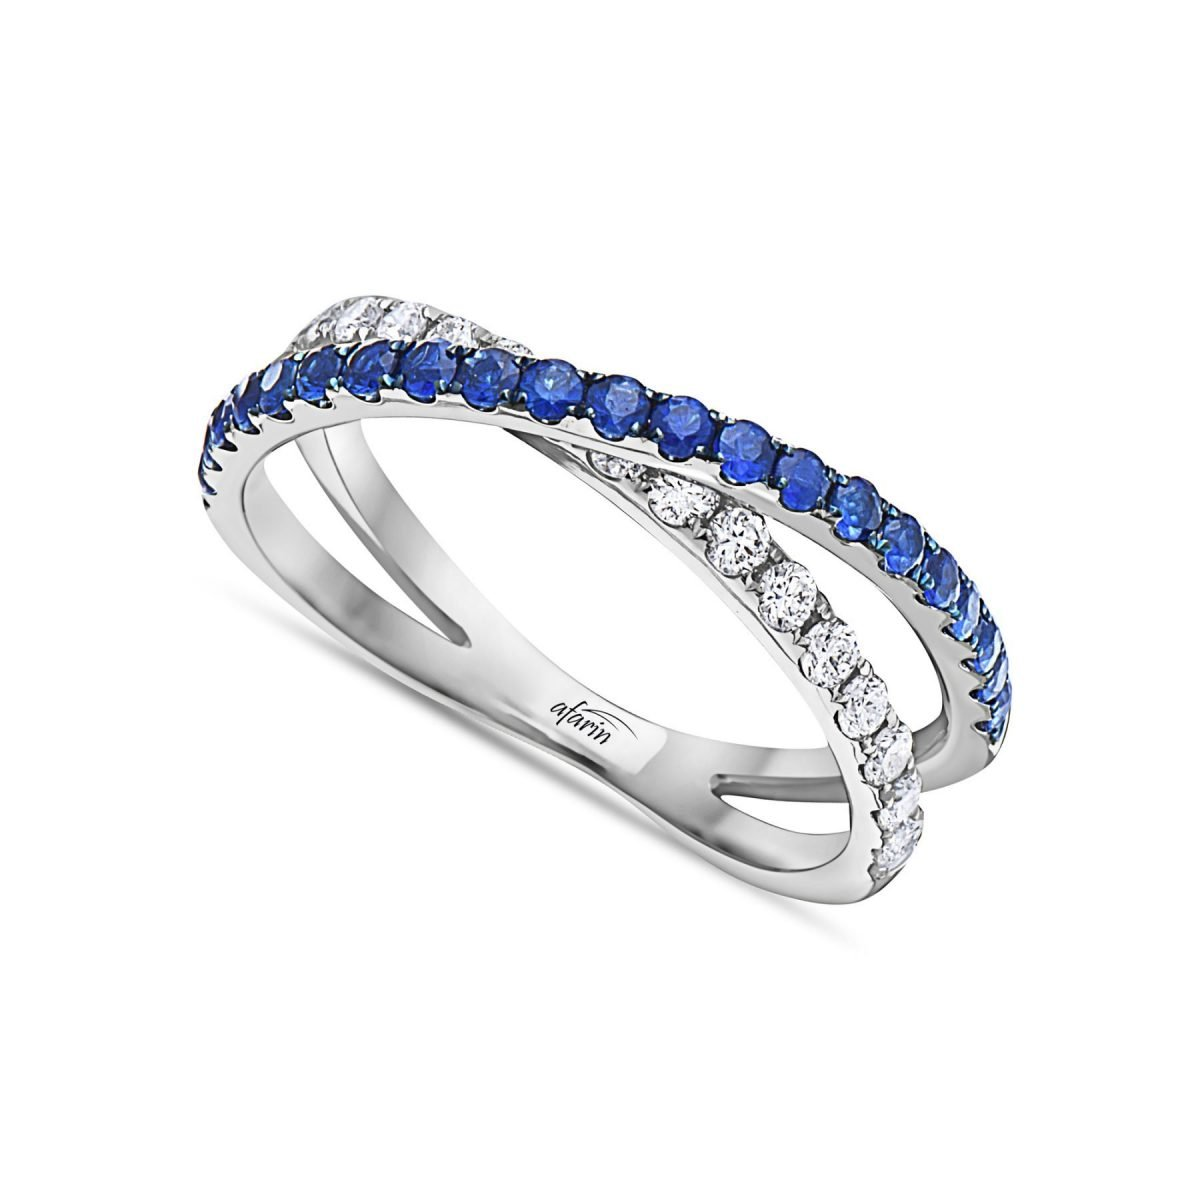 BLUE SAPPHIRE & DIAMOND CROSS OVER RING